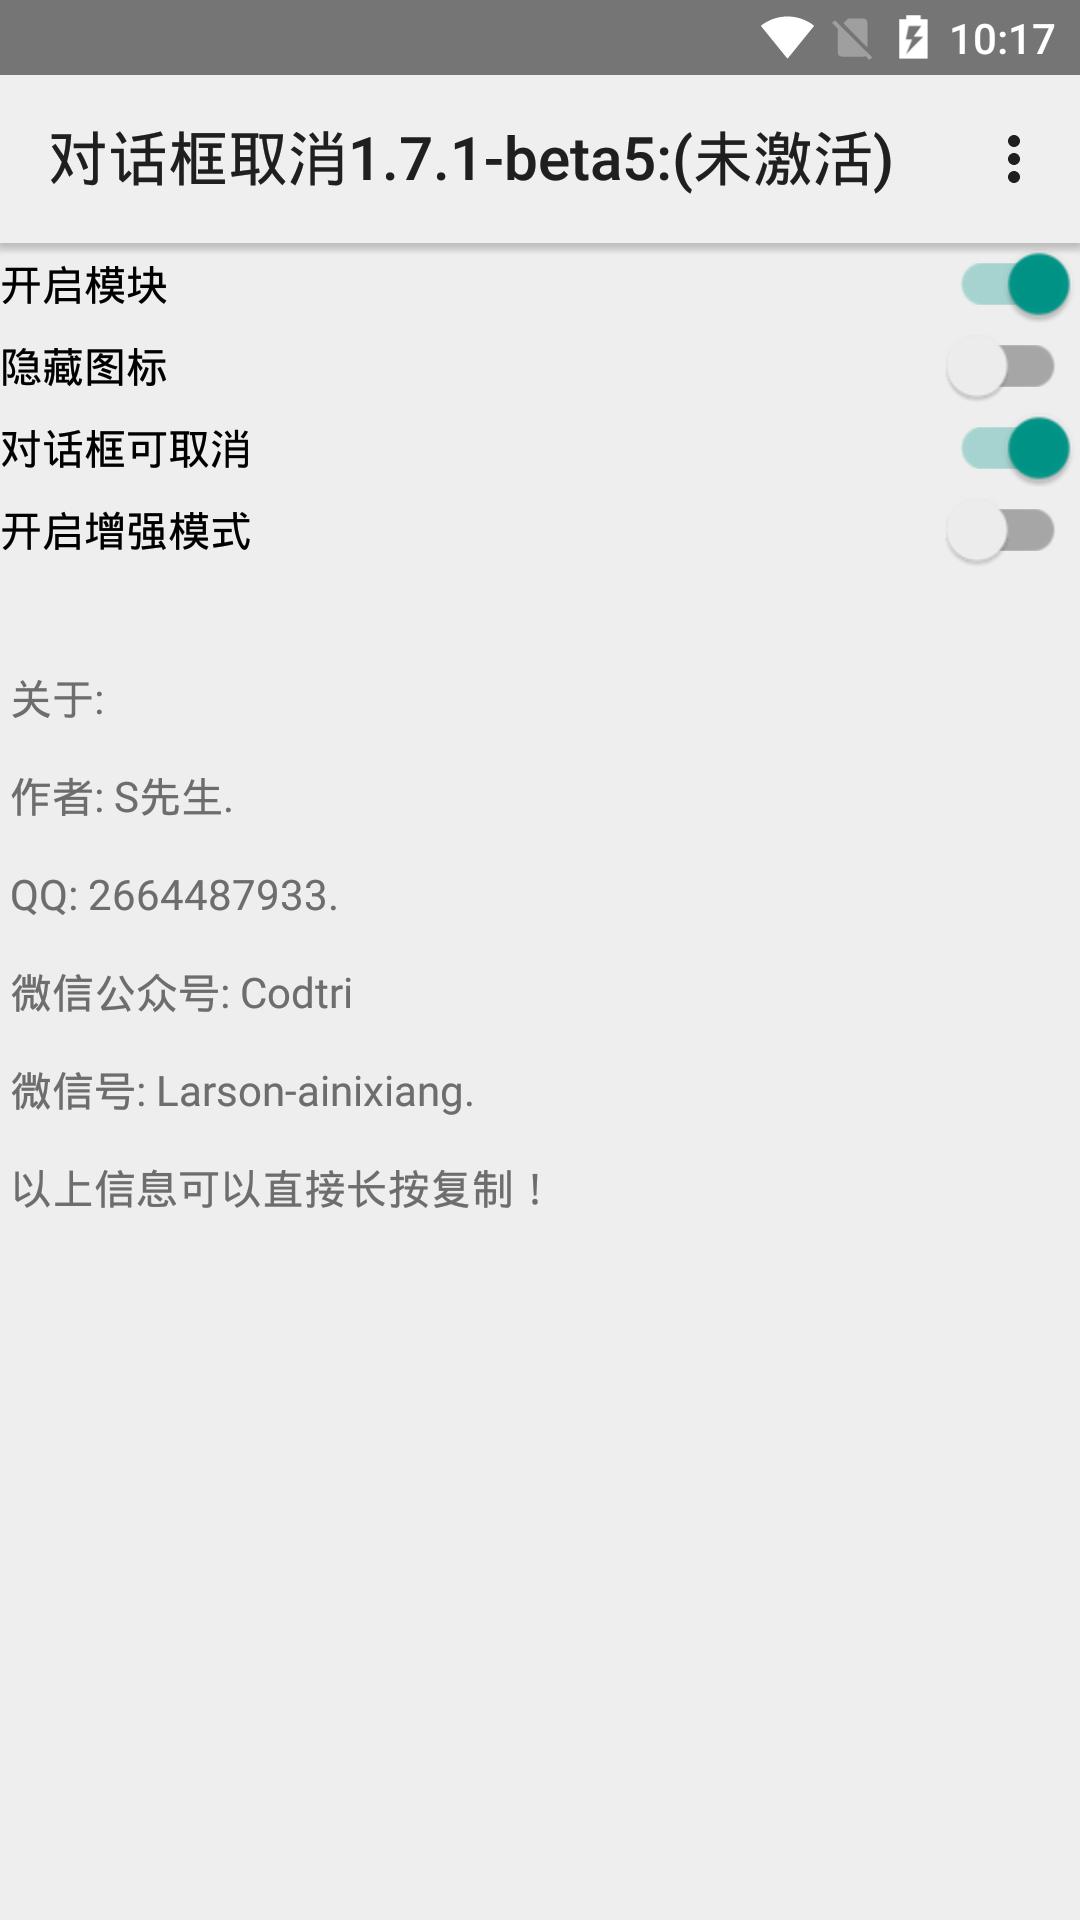 Screenshot_2020-03-26-22-17-02.png